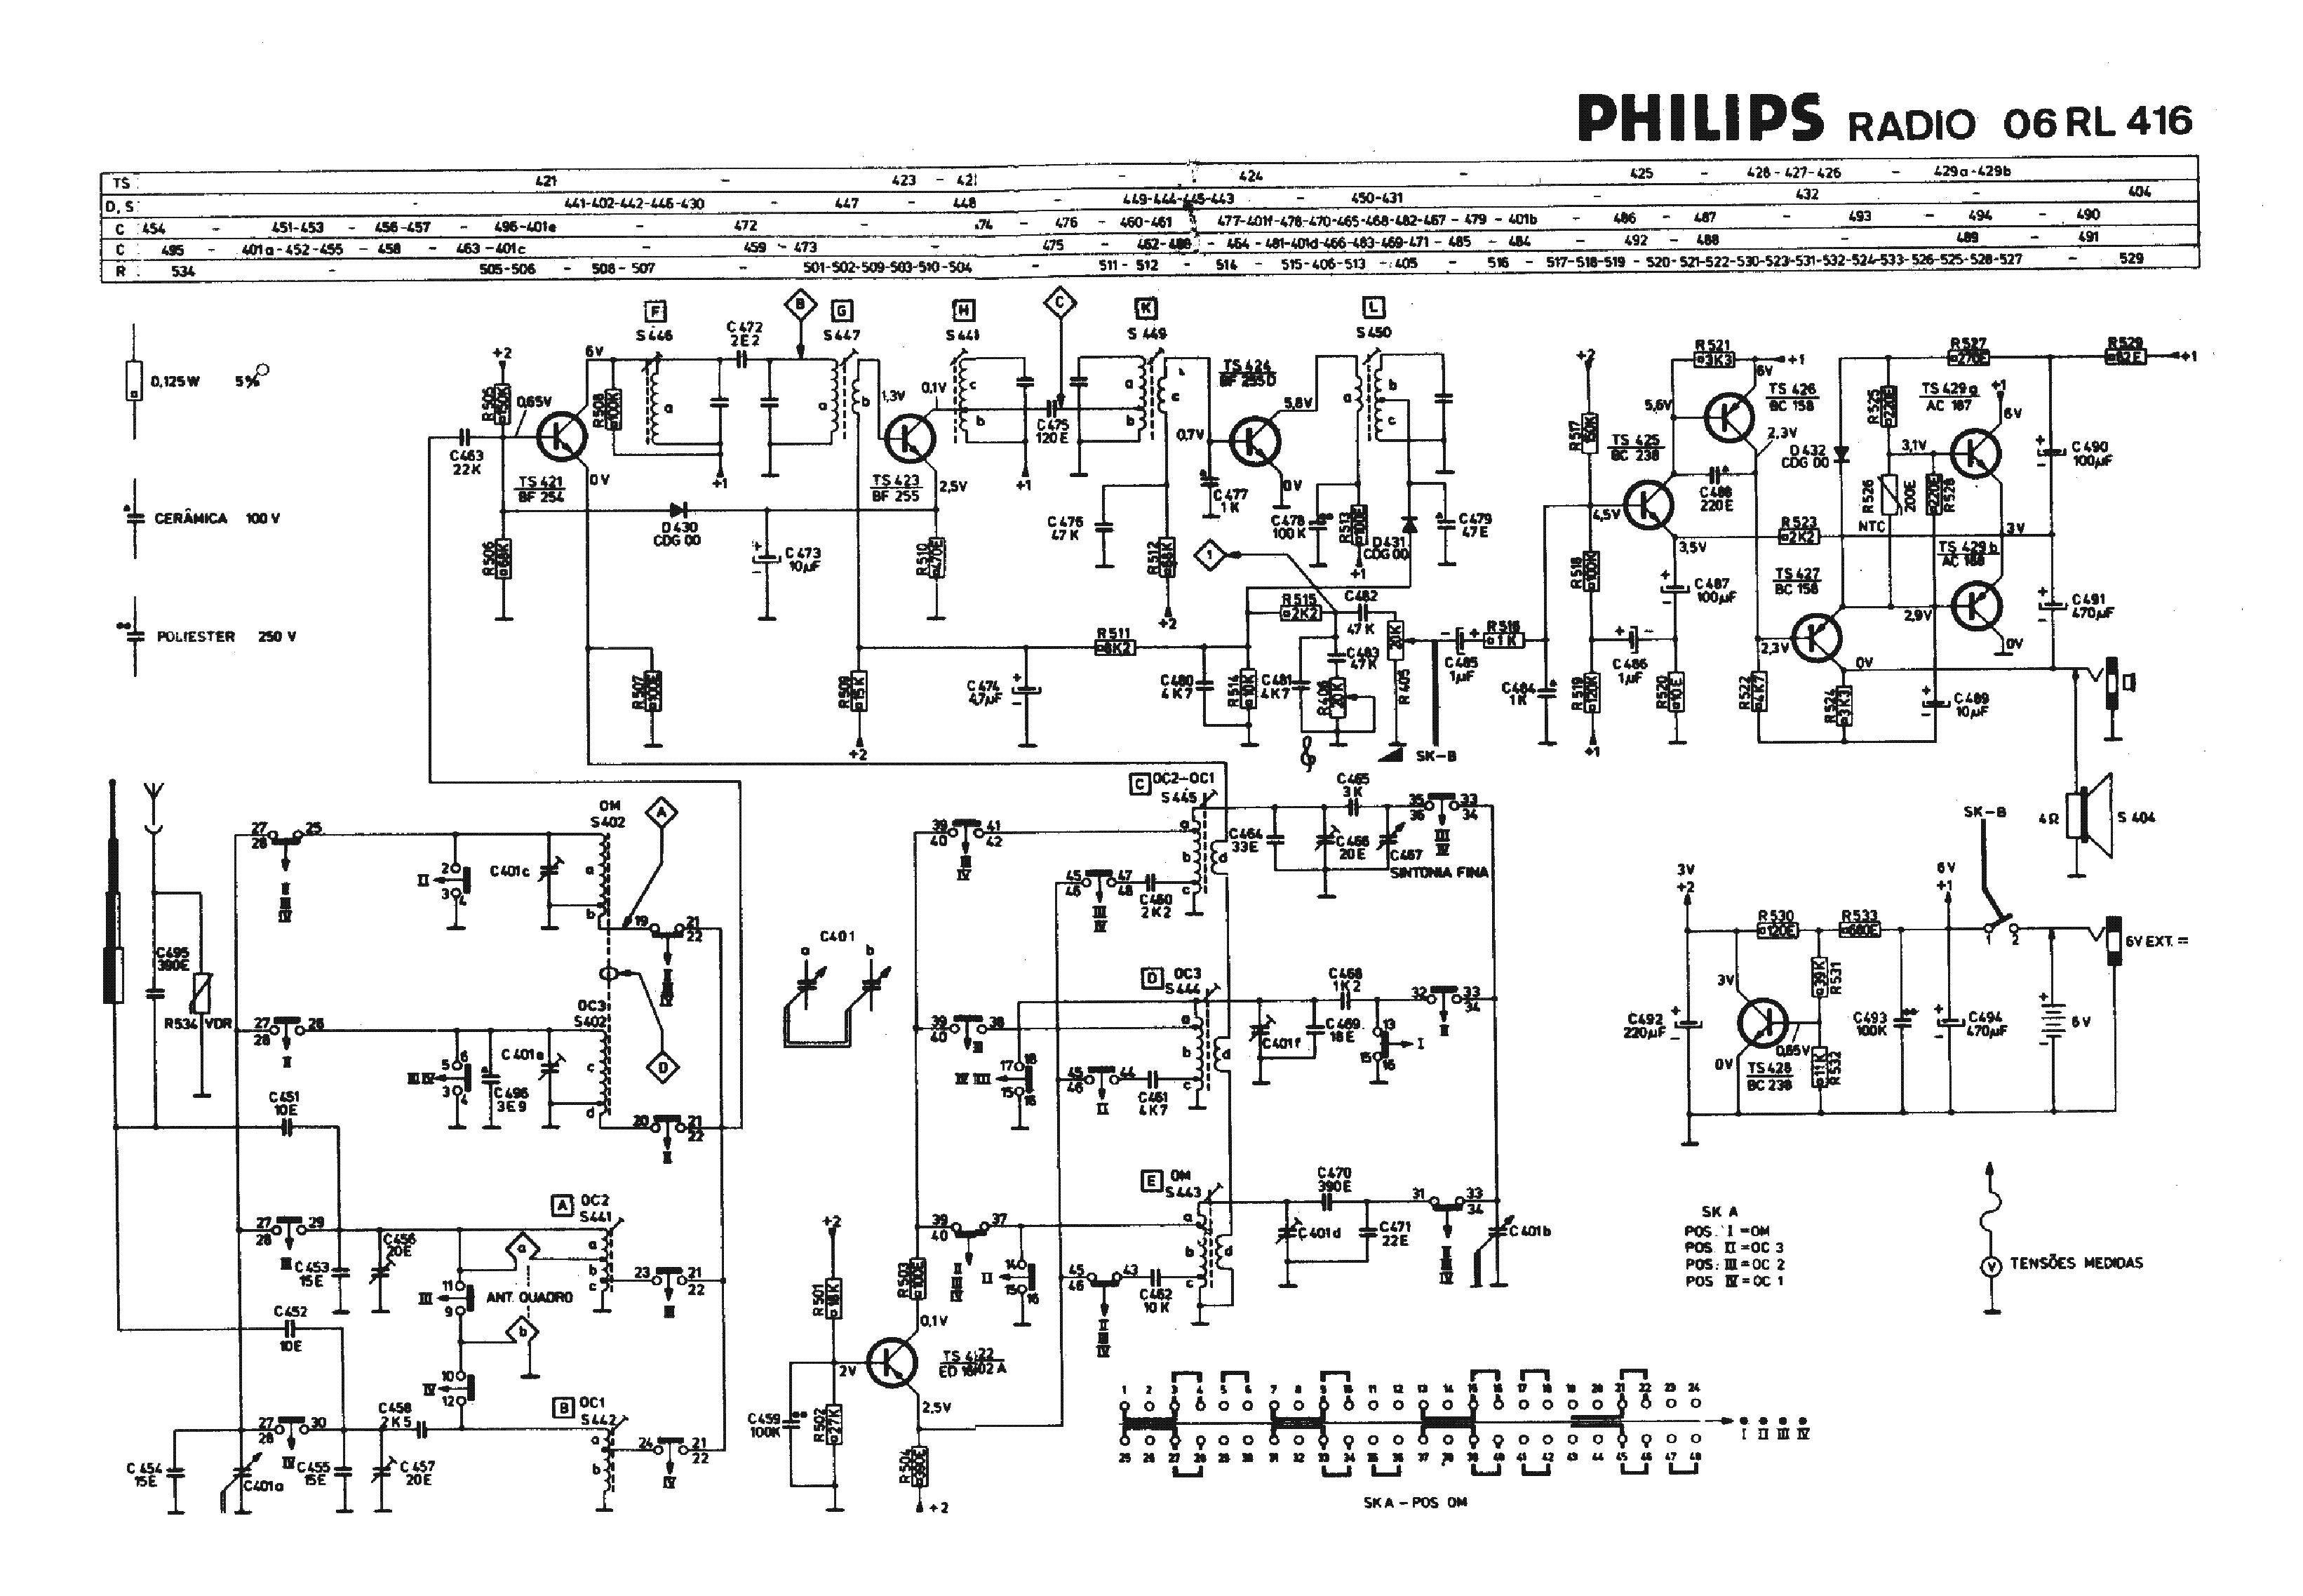 Philips 06rl416 Transistor Radio Sch Service Manual